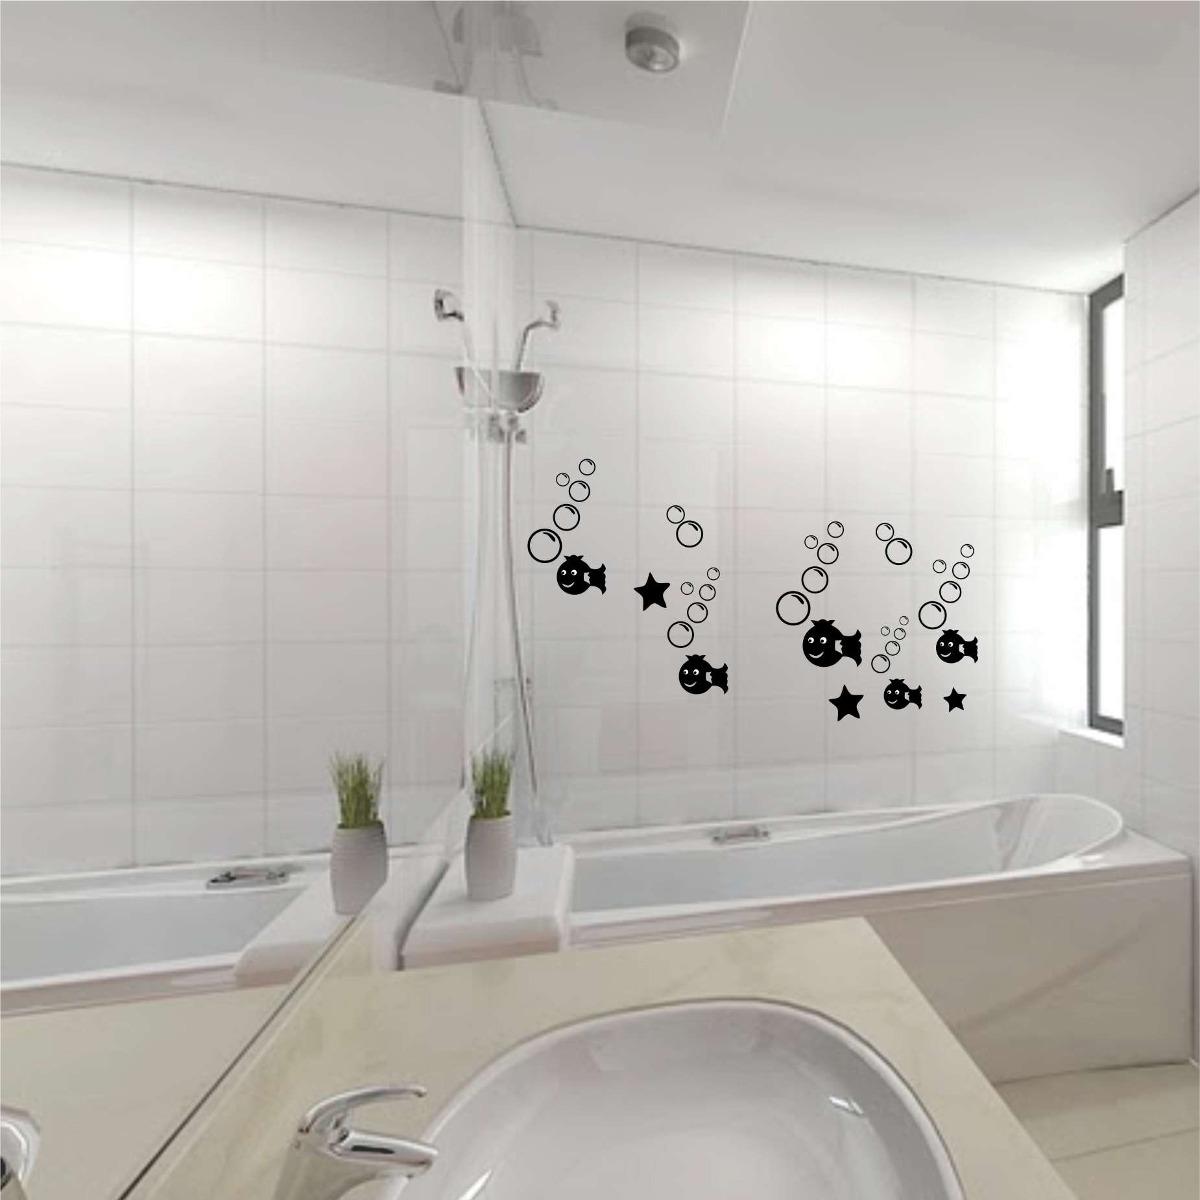 Vinilos decorativos ba o oferta especial 590 for Vinilos para paredes de banos